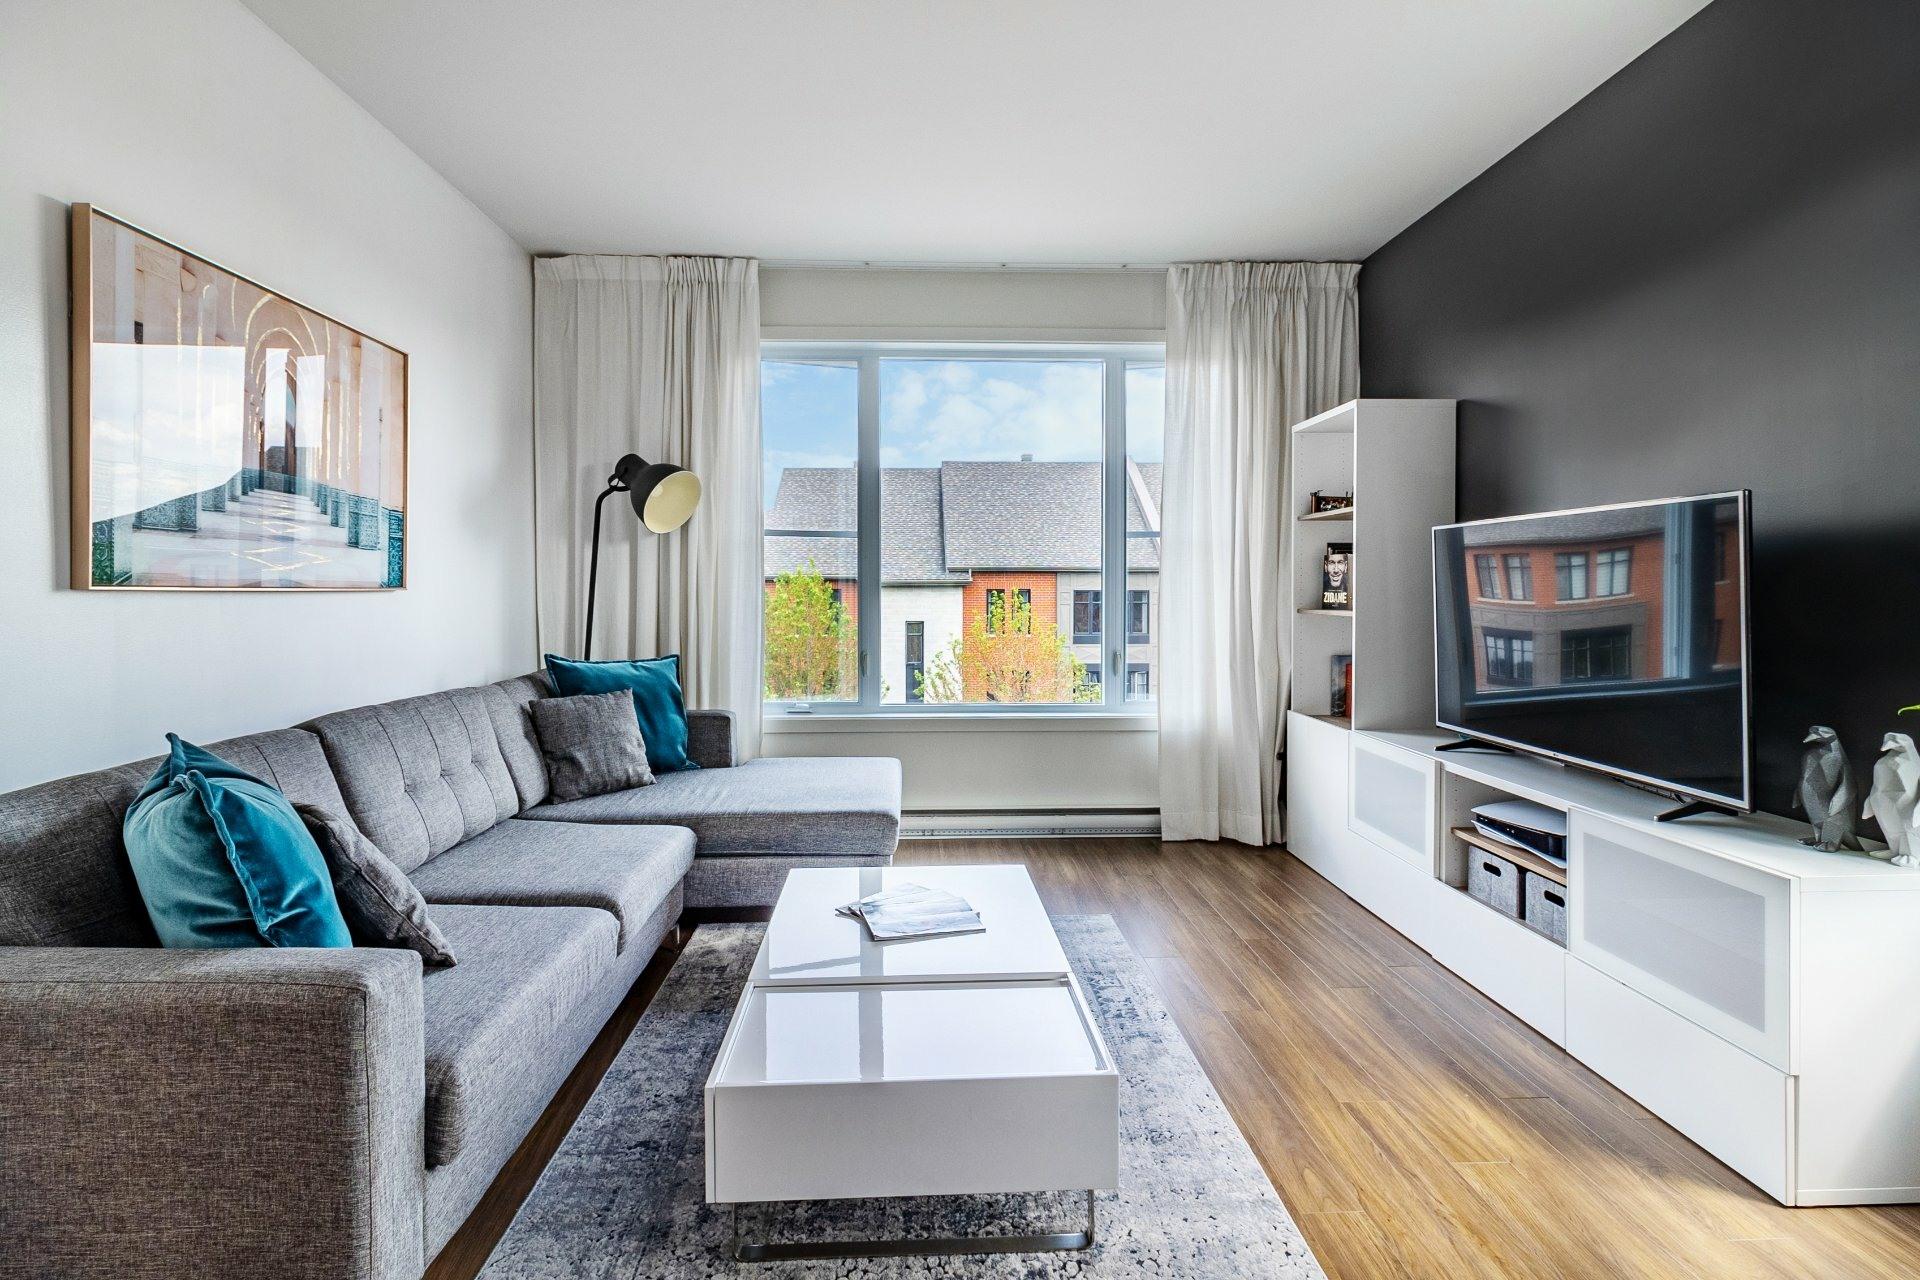 image 7 - Apartment For sale Saint-Hubert Longueuil  - 7 rooms